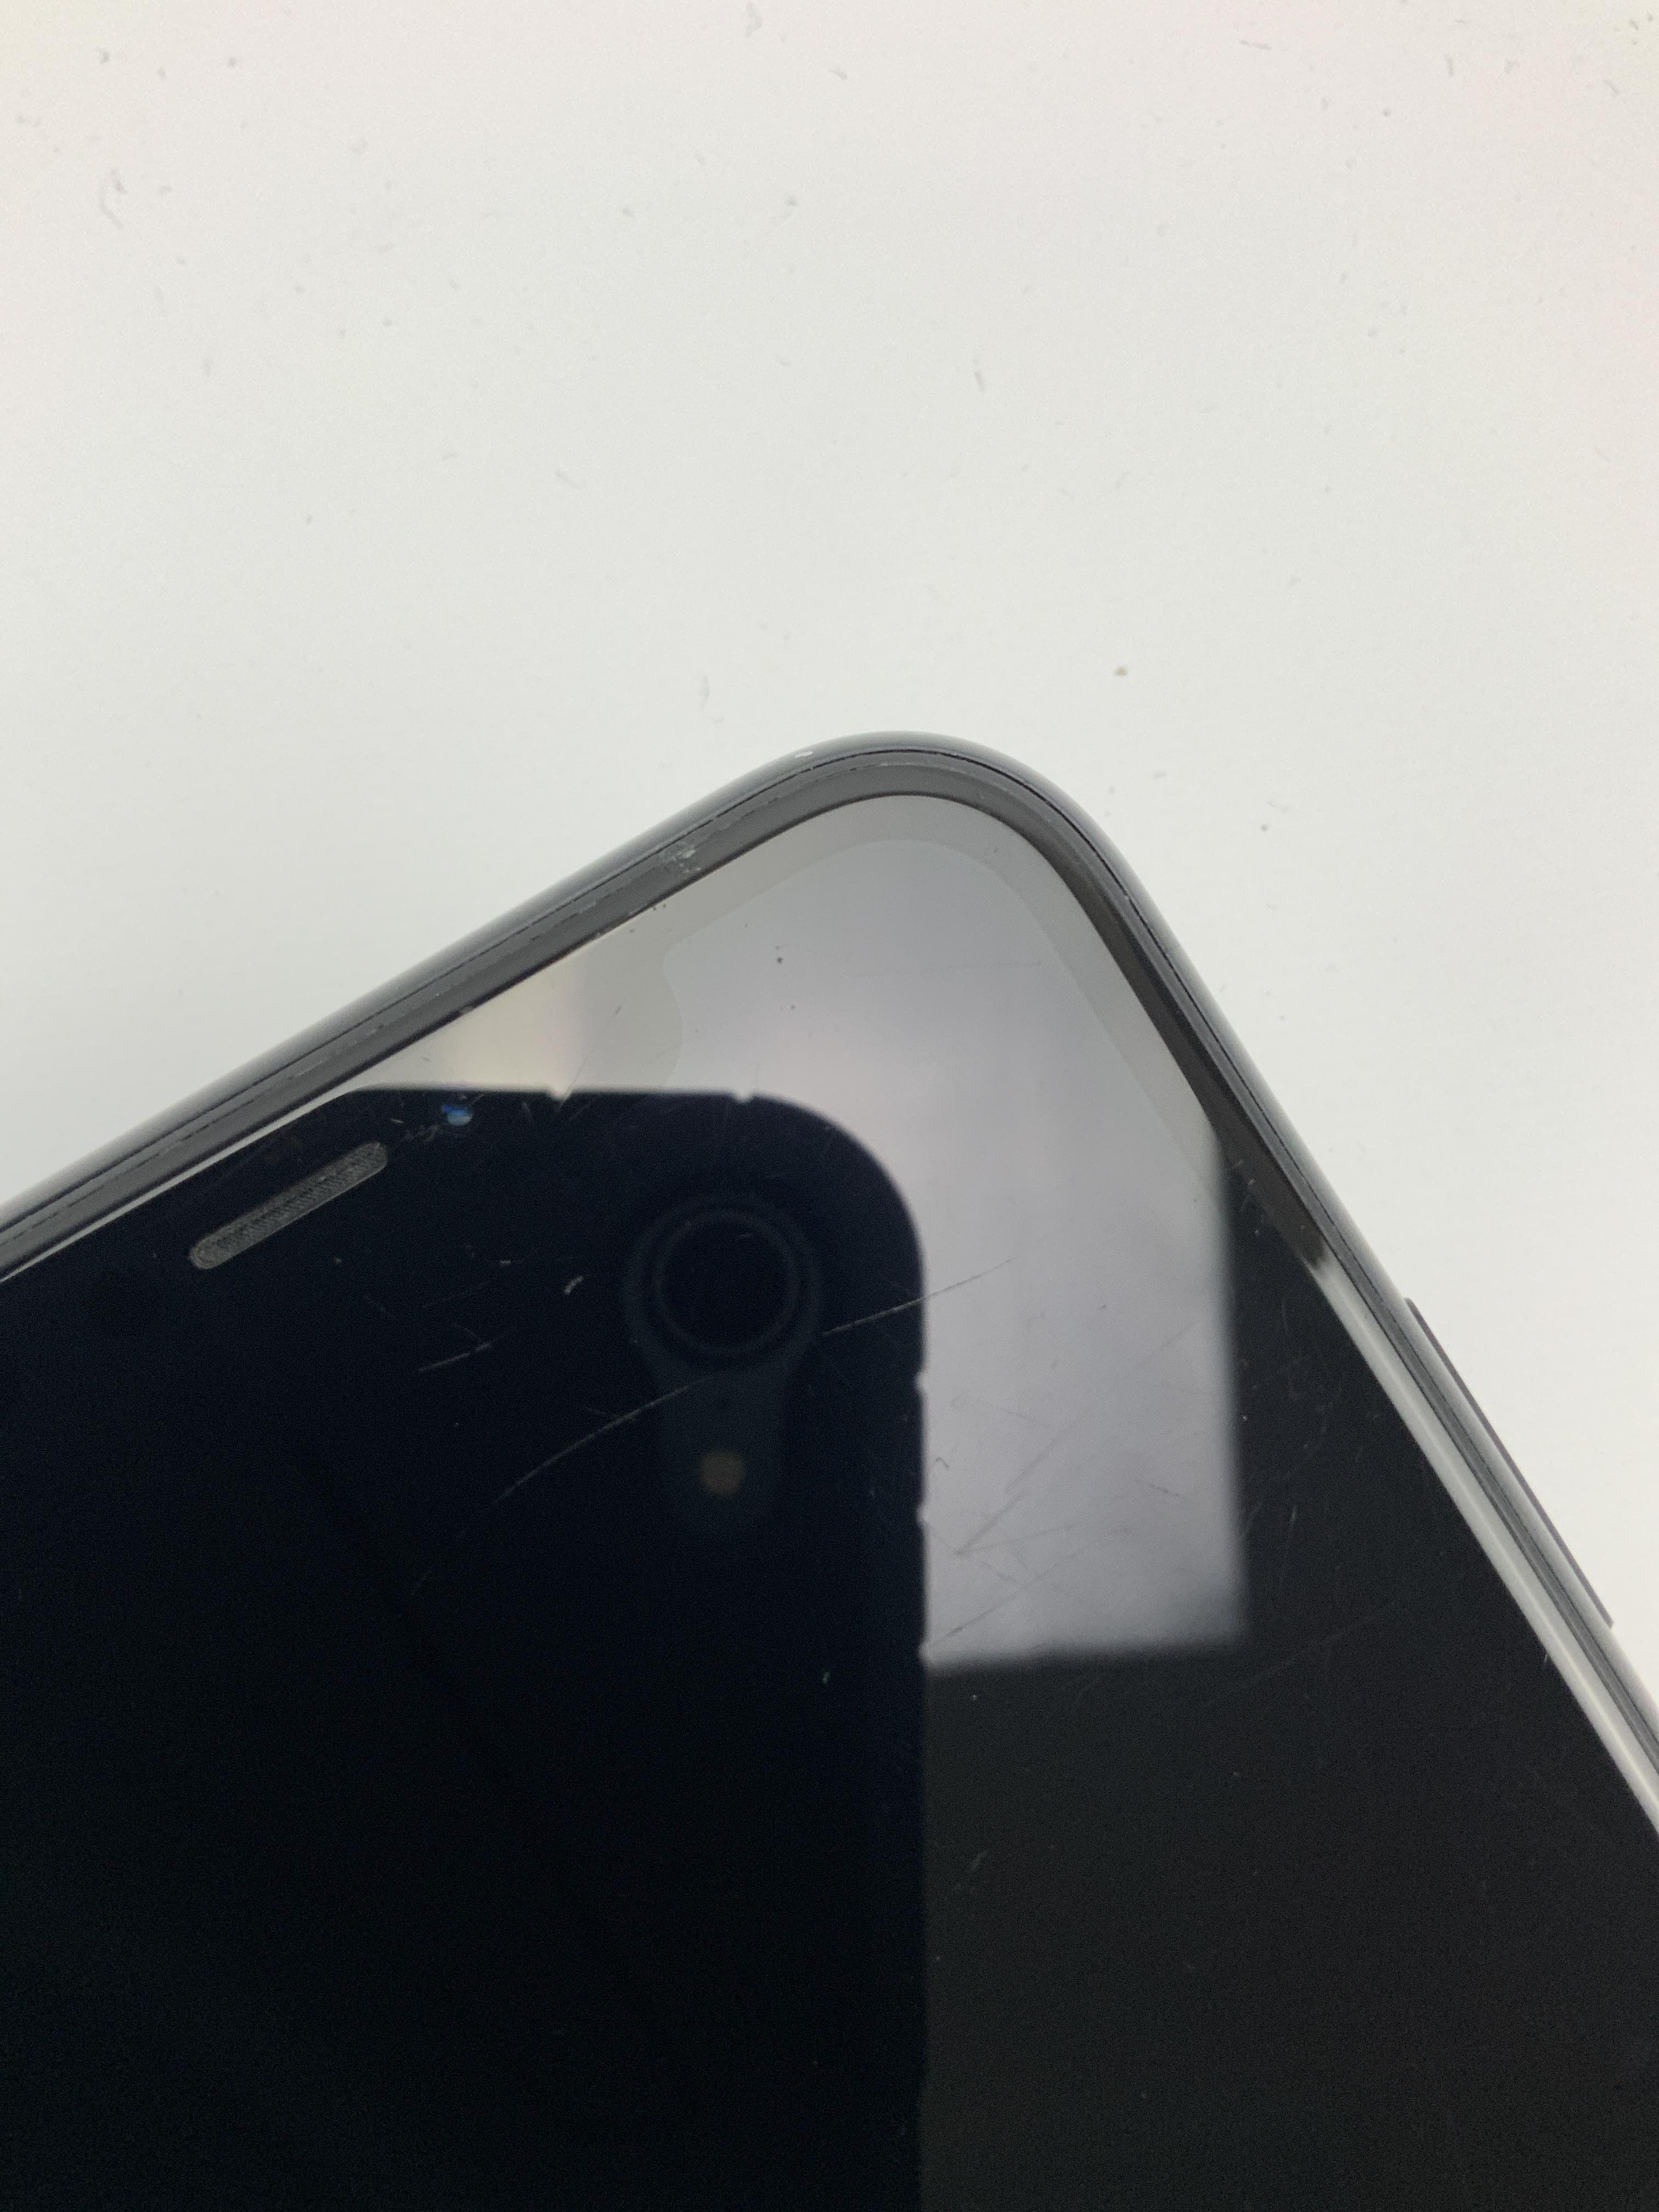 iPhone XR 64GB, 64GB, Black, imagen 4